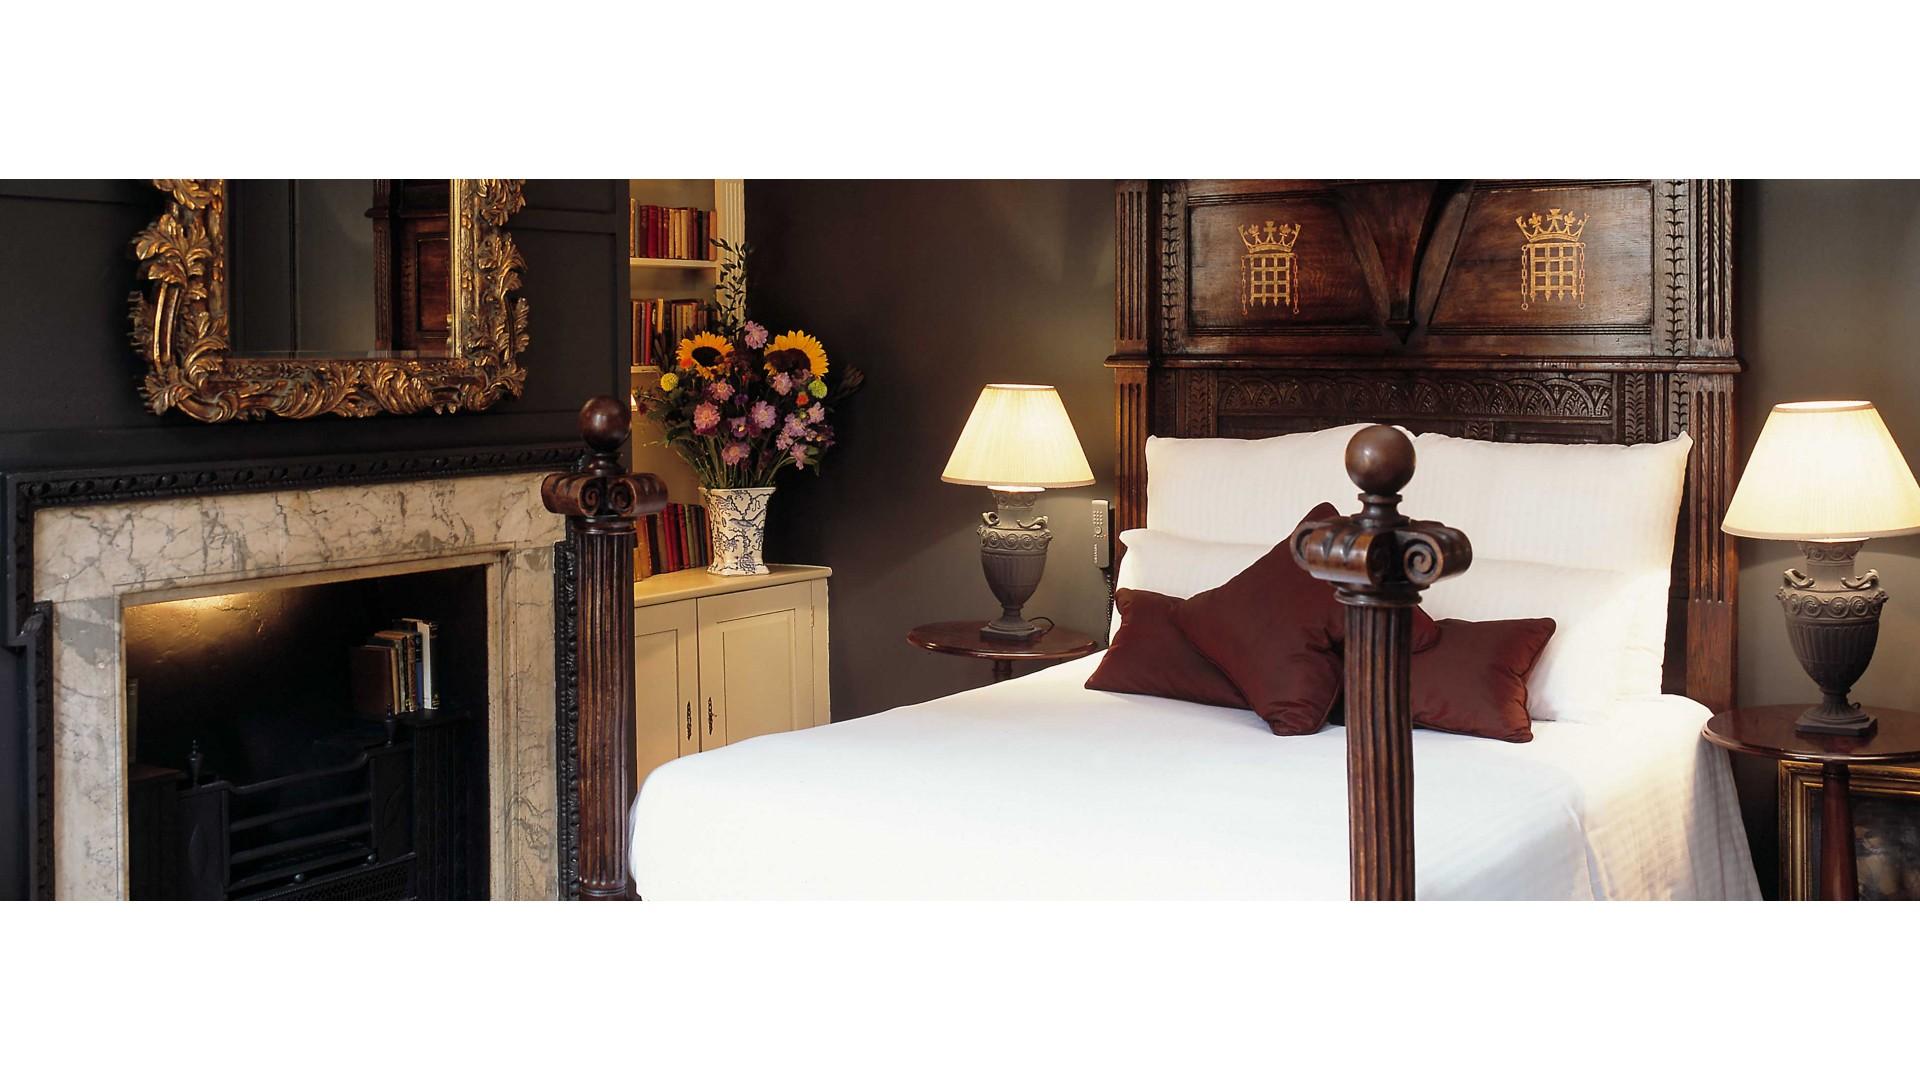 Hazlitts hotel soho london england smith hotels hazlitts gumiabroncs Choice Image